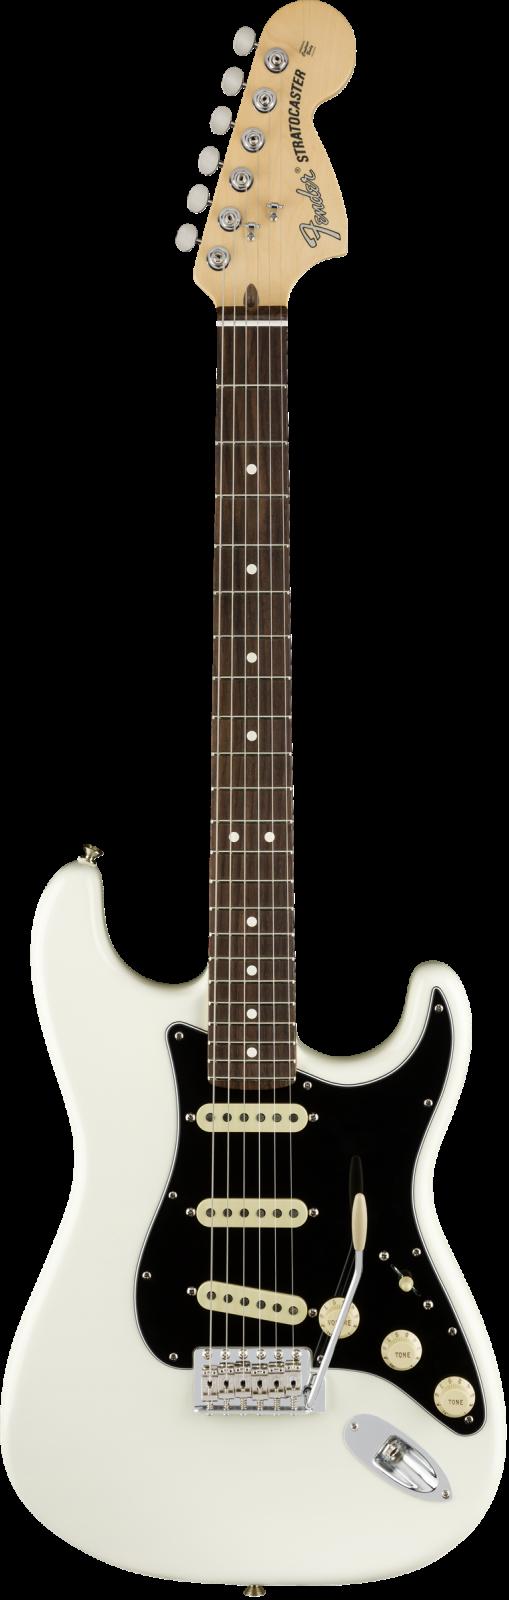 American Performer Styratocaster RW AWT Anitque White